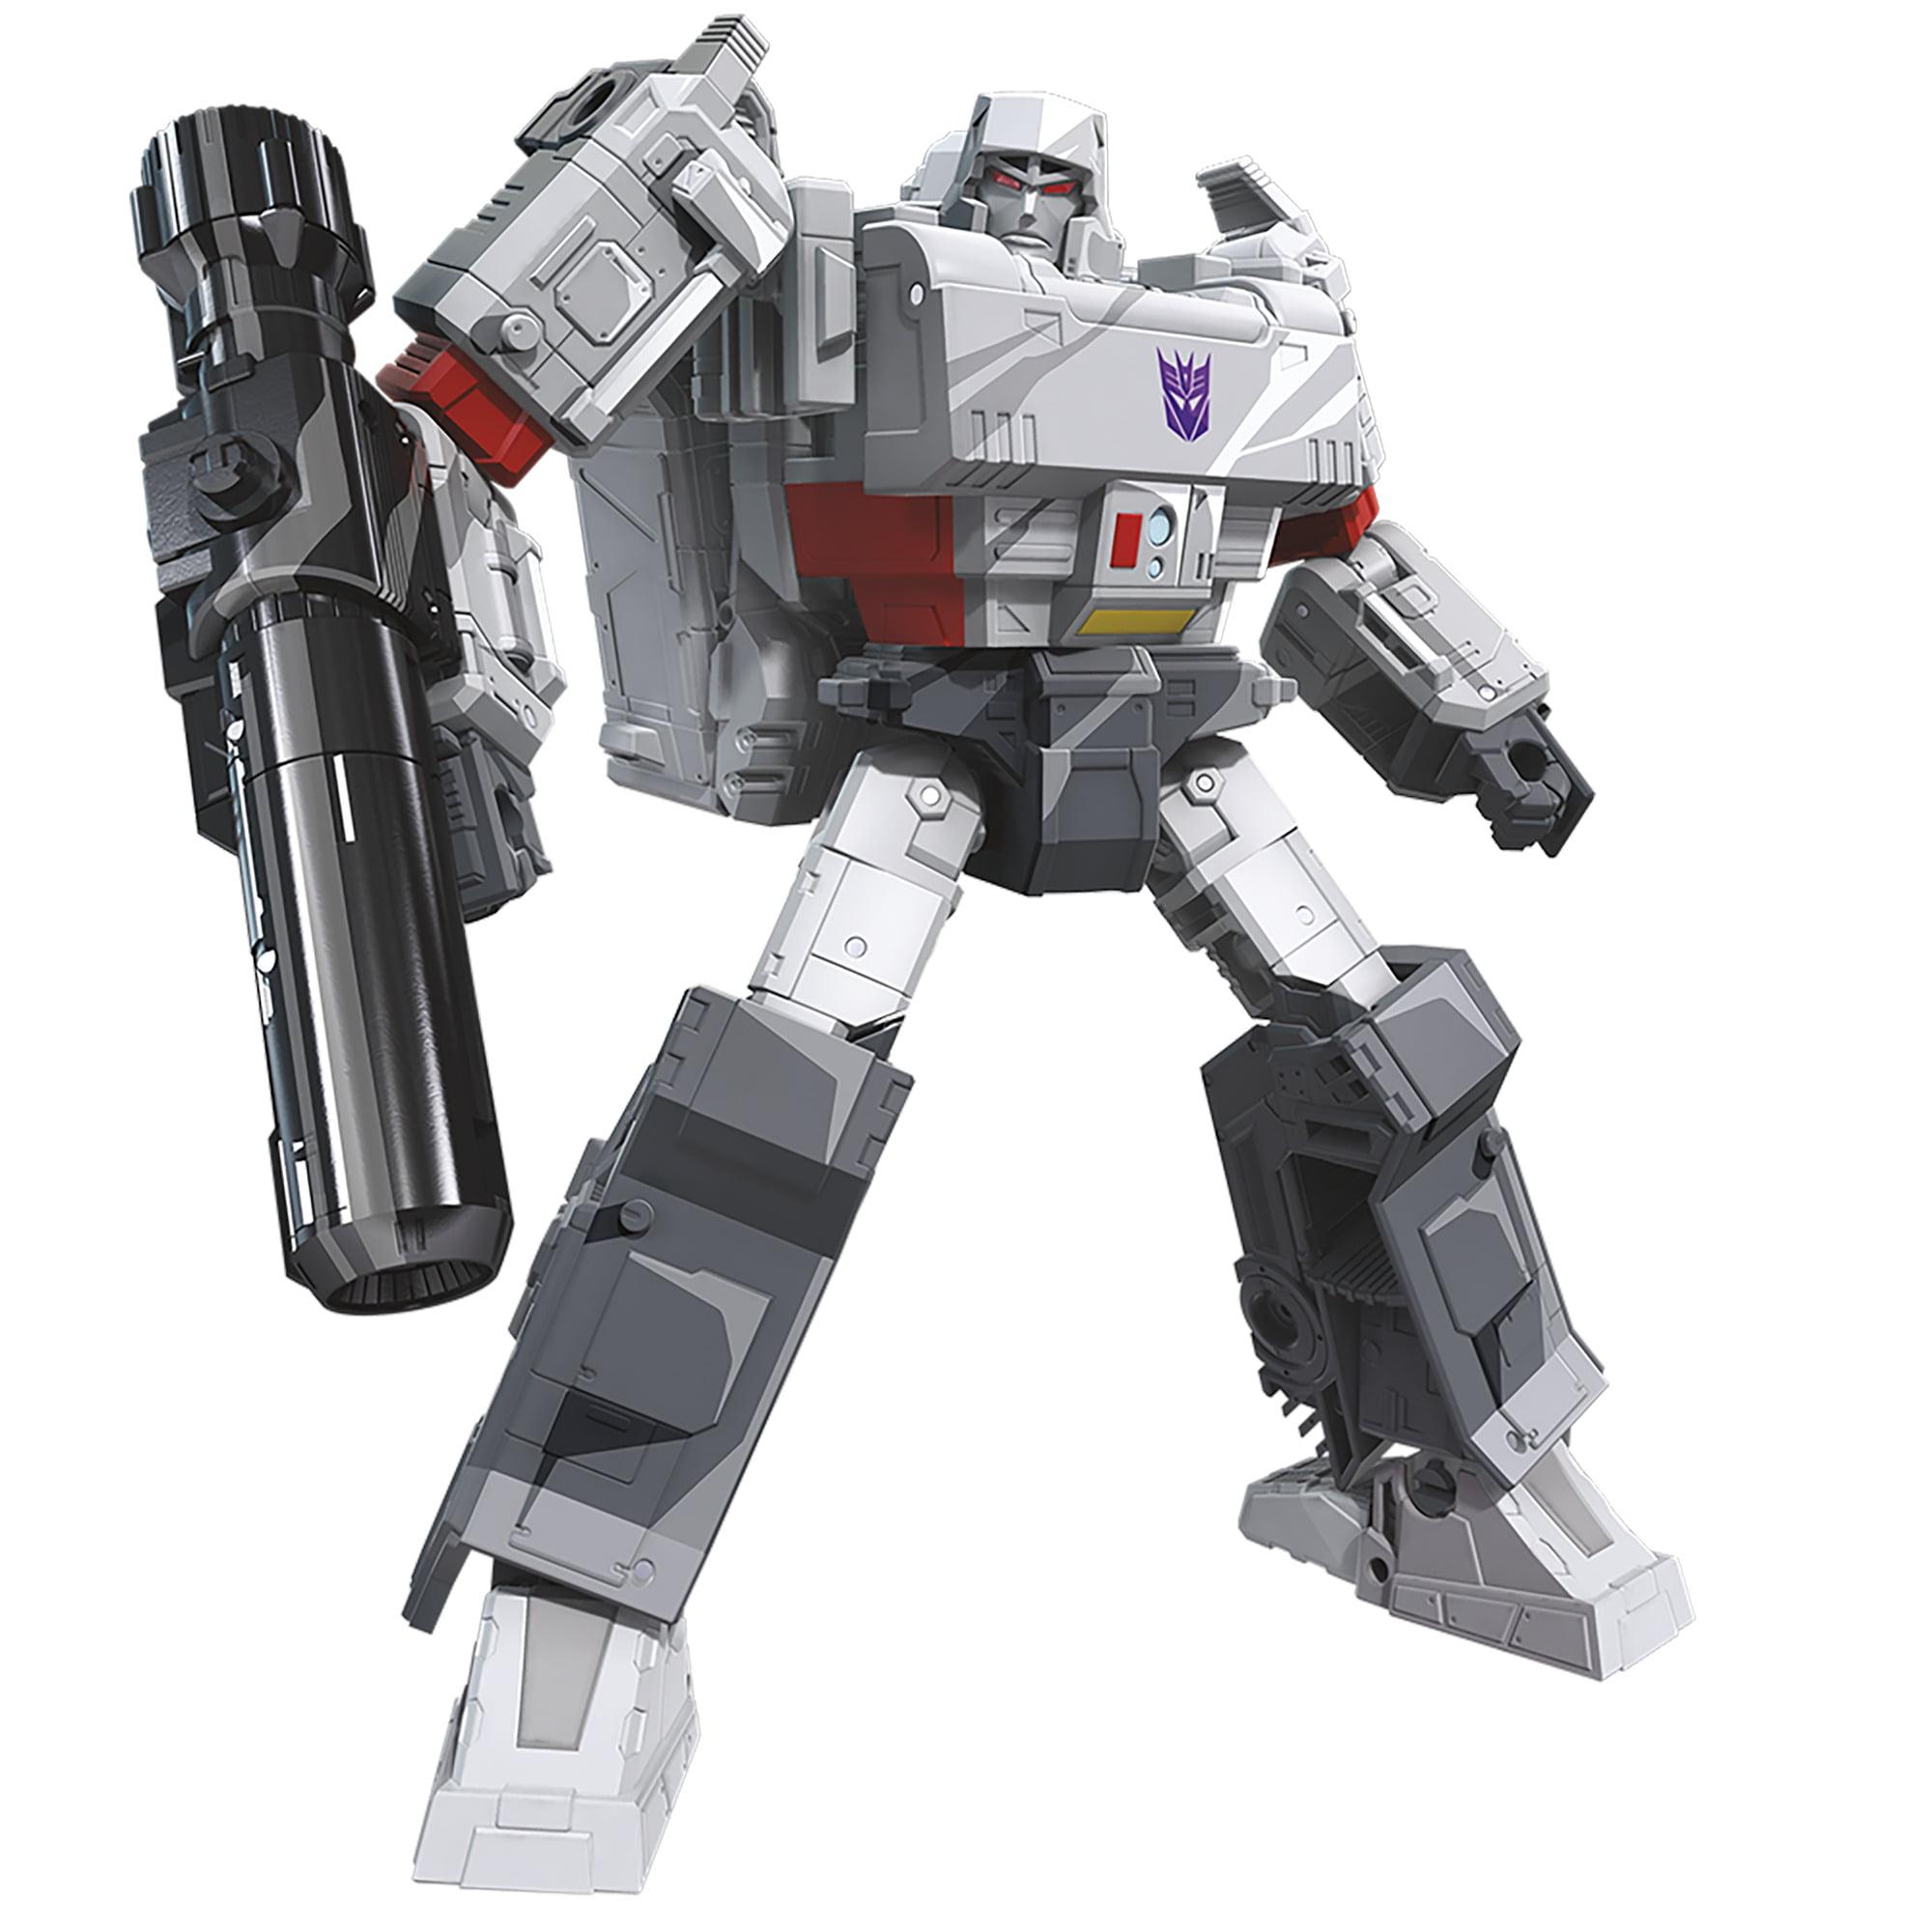 Hasbro Transformers Voyager Classic Megatron Figure